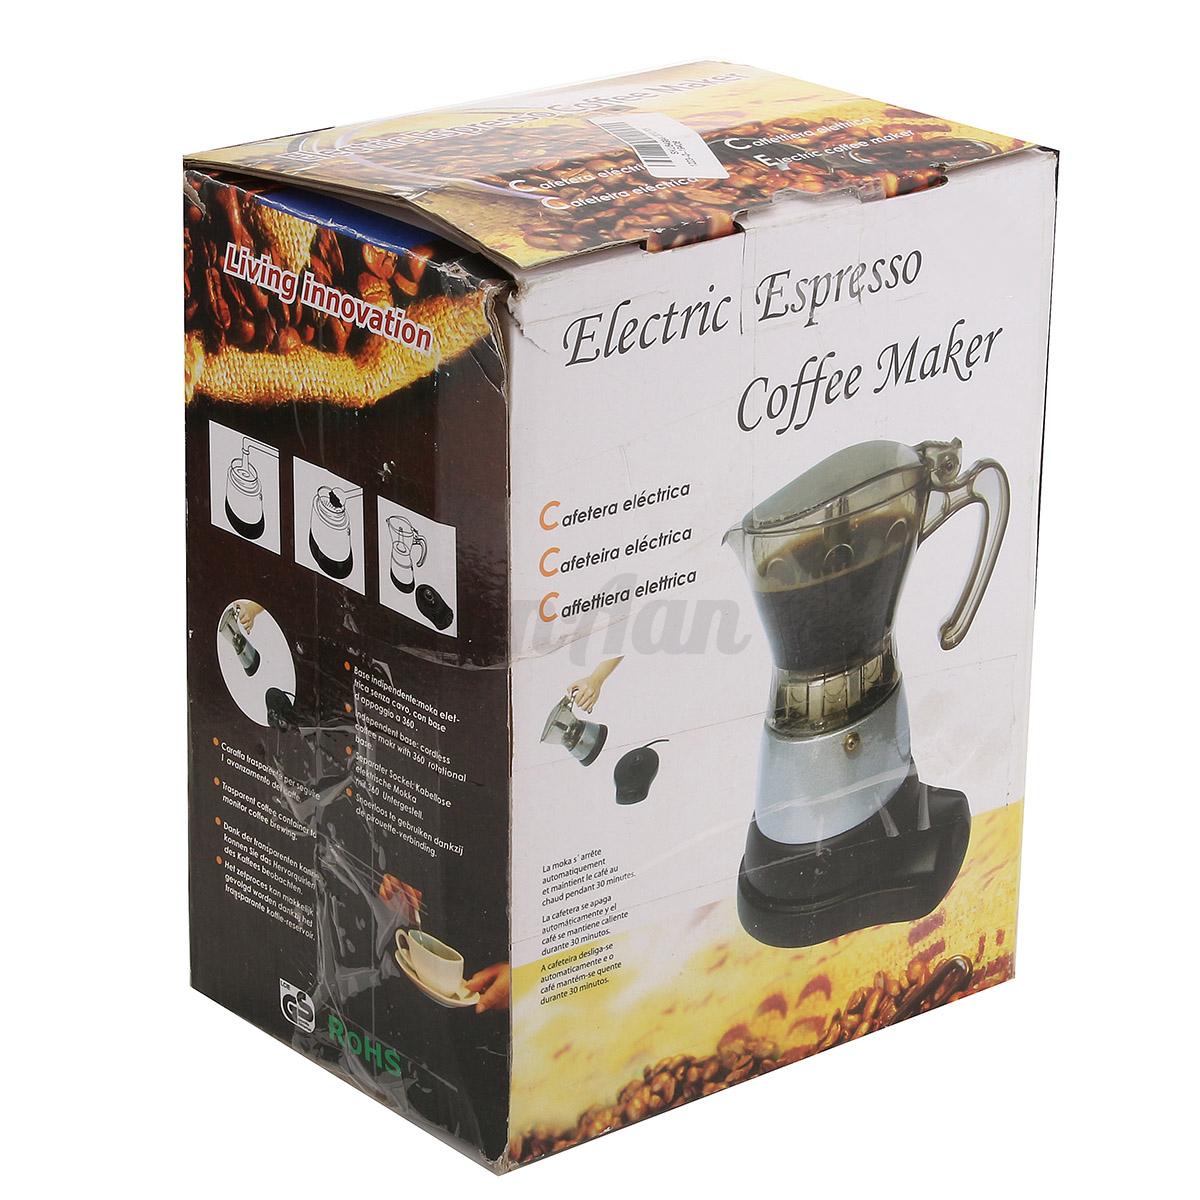 Coffee Maker Home Automatic Handmade Stainless Steel 4-Cup Coffeemaker Machine eBay